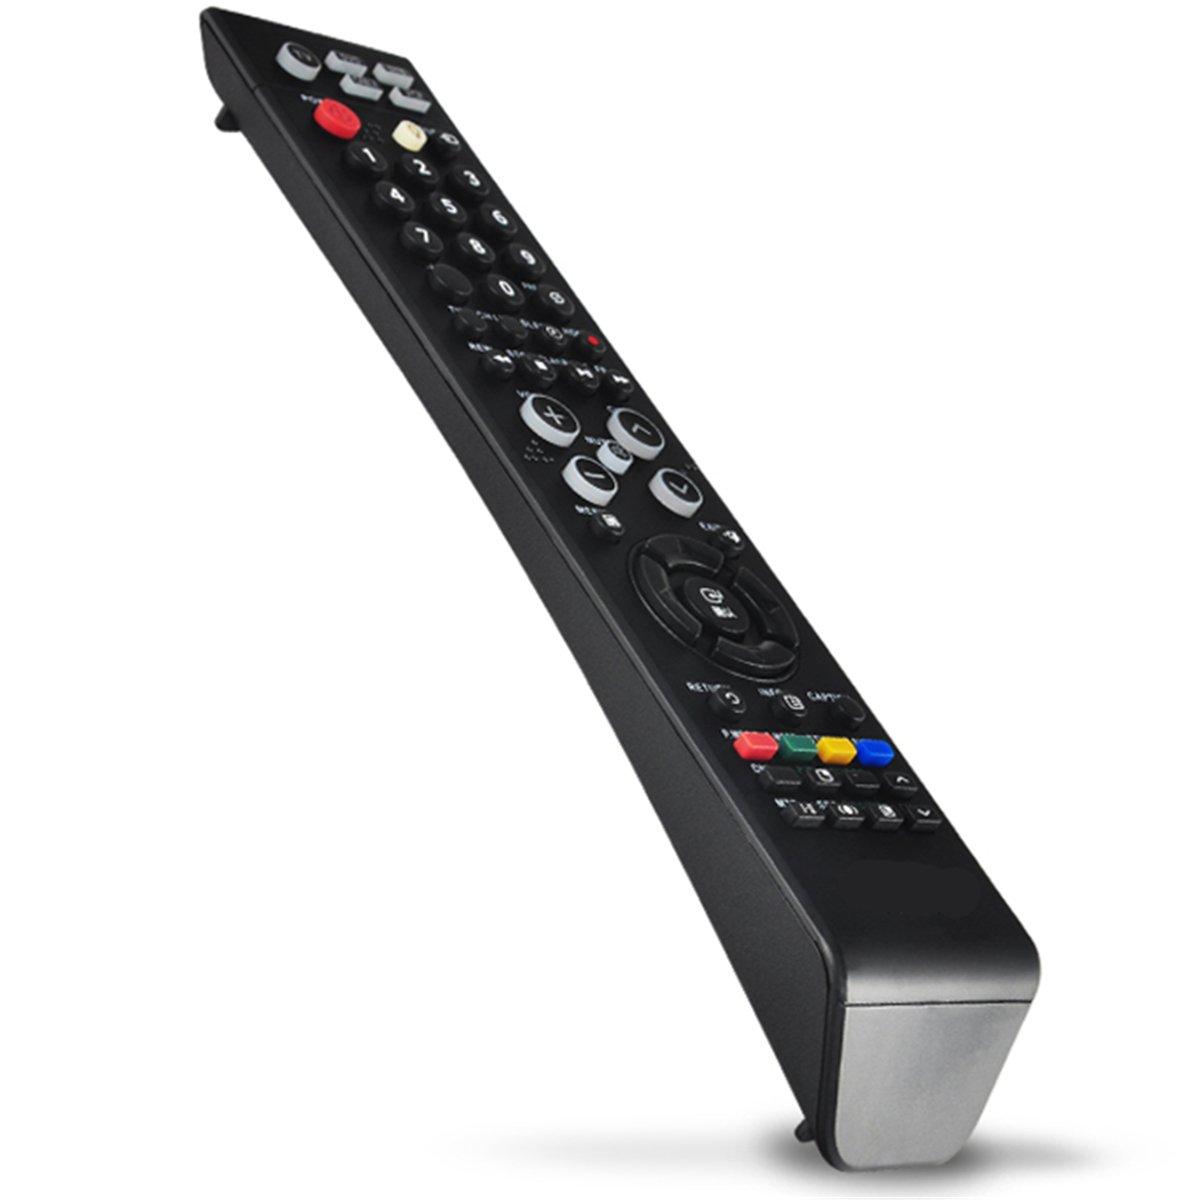 Mando a distancia compatible con Samsung Tv BN59-00624A T220HD ...